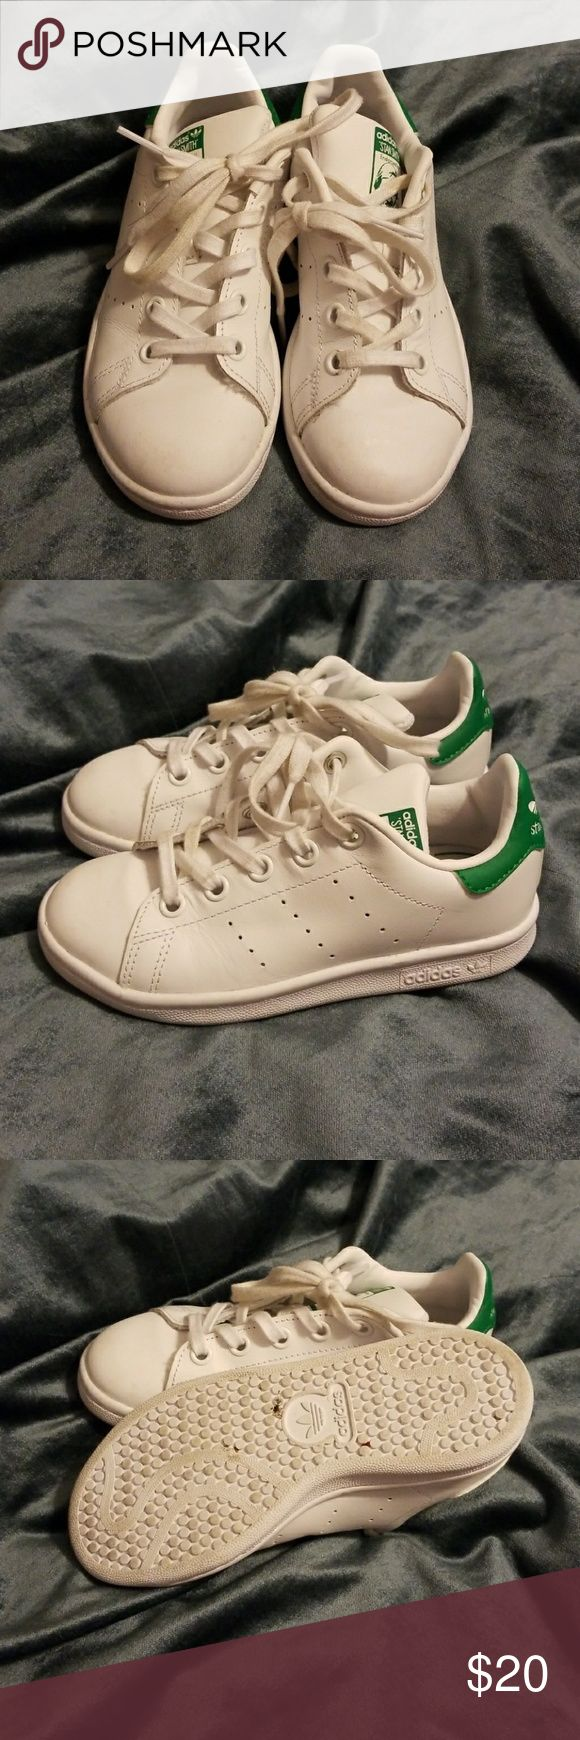 💚Stan Smith Adidas Gently worn little boy's Stan Smith adidas adidas Shoes Sneakers